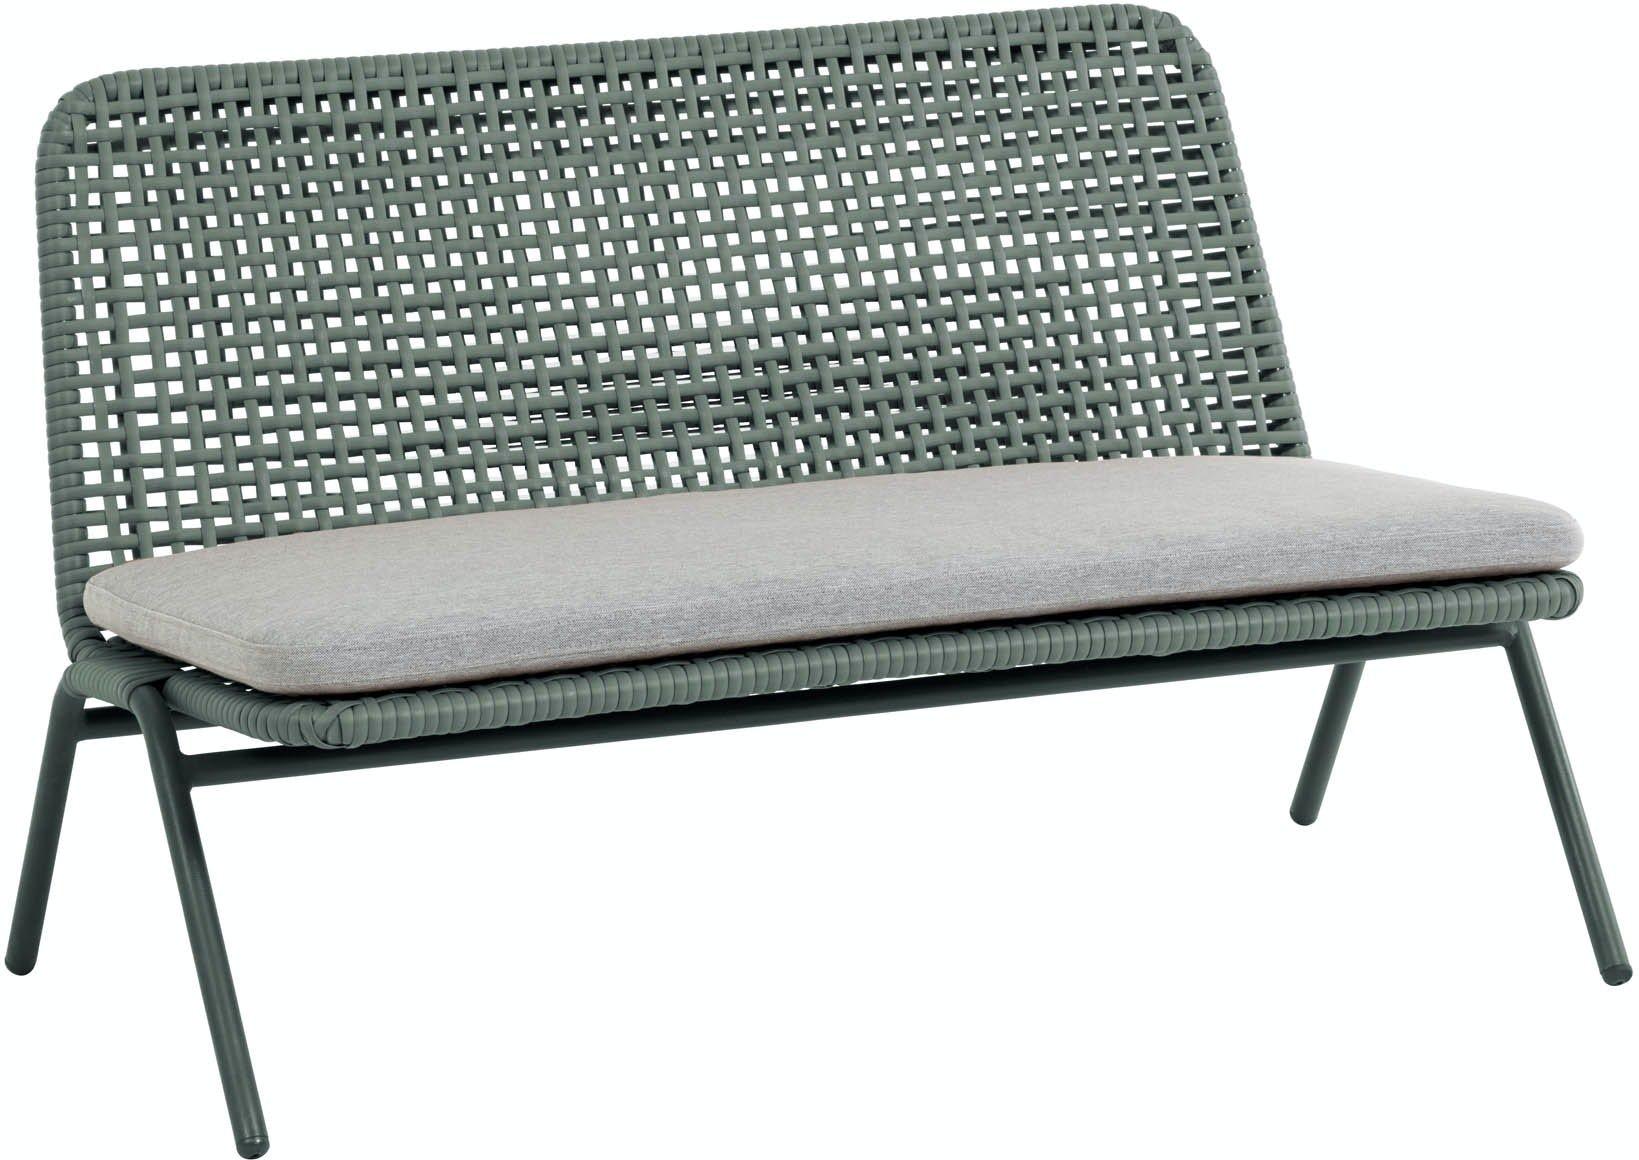 Wivina, Udendørs 2-personers sofa by LaForma (H: 72 cm. B: 120 cm. L: 62 cm., Grøn)